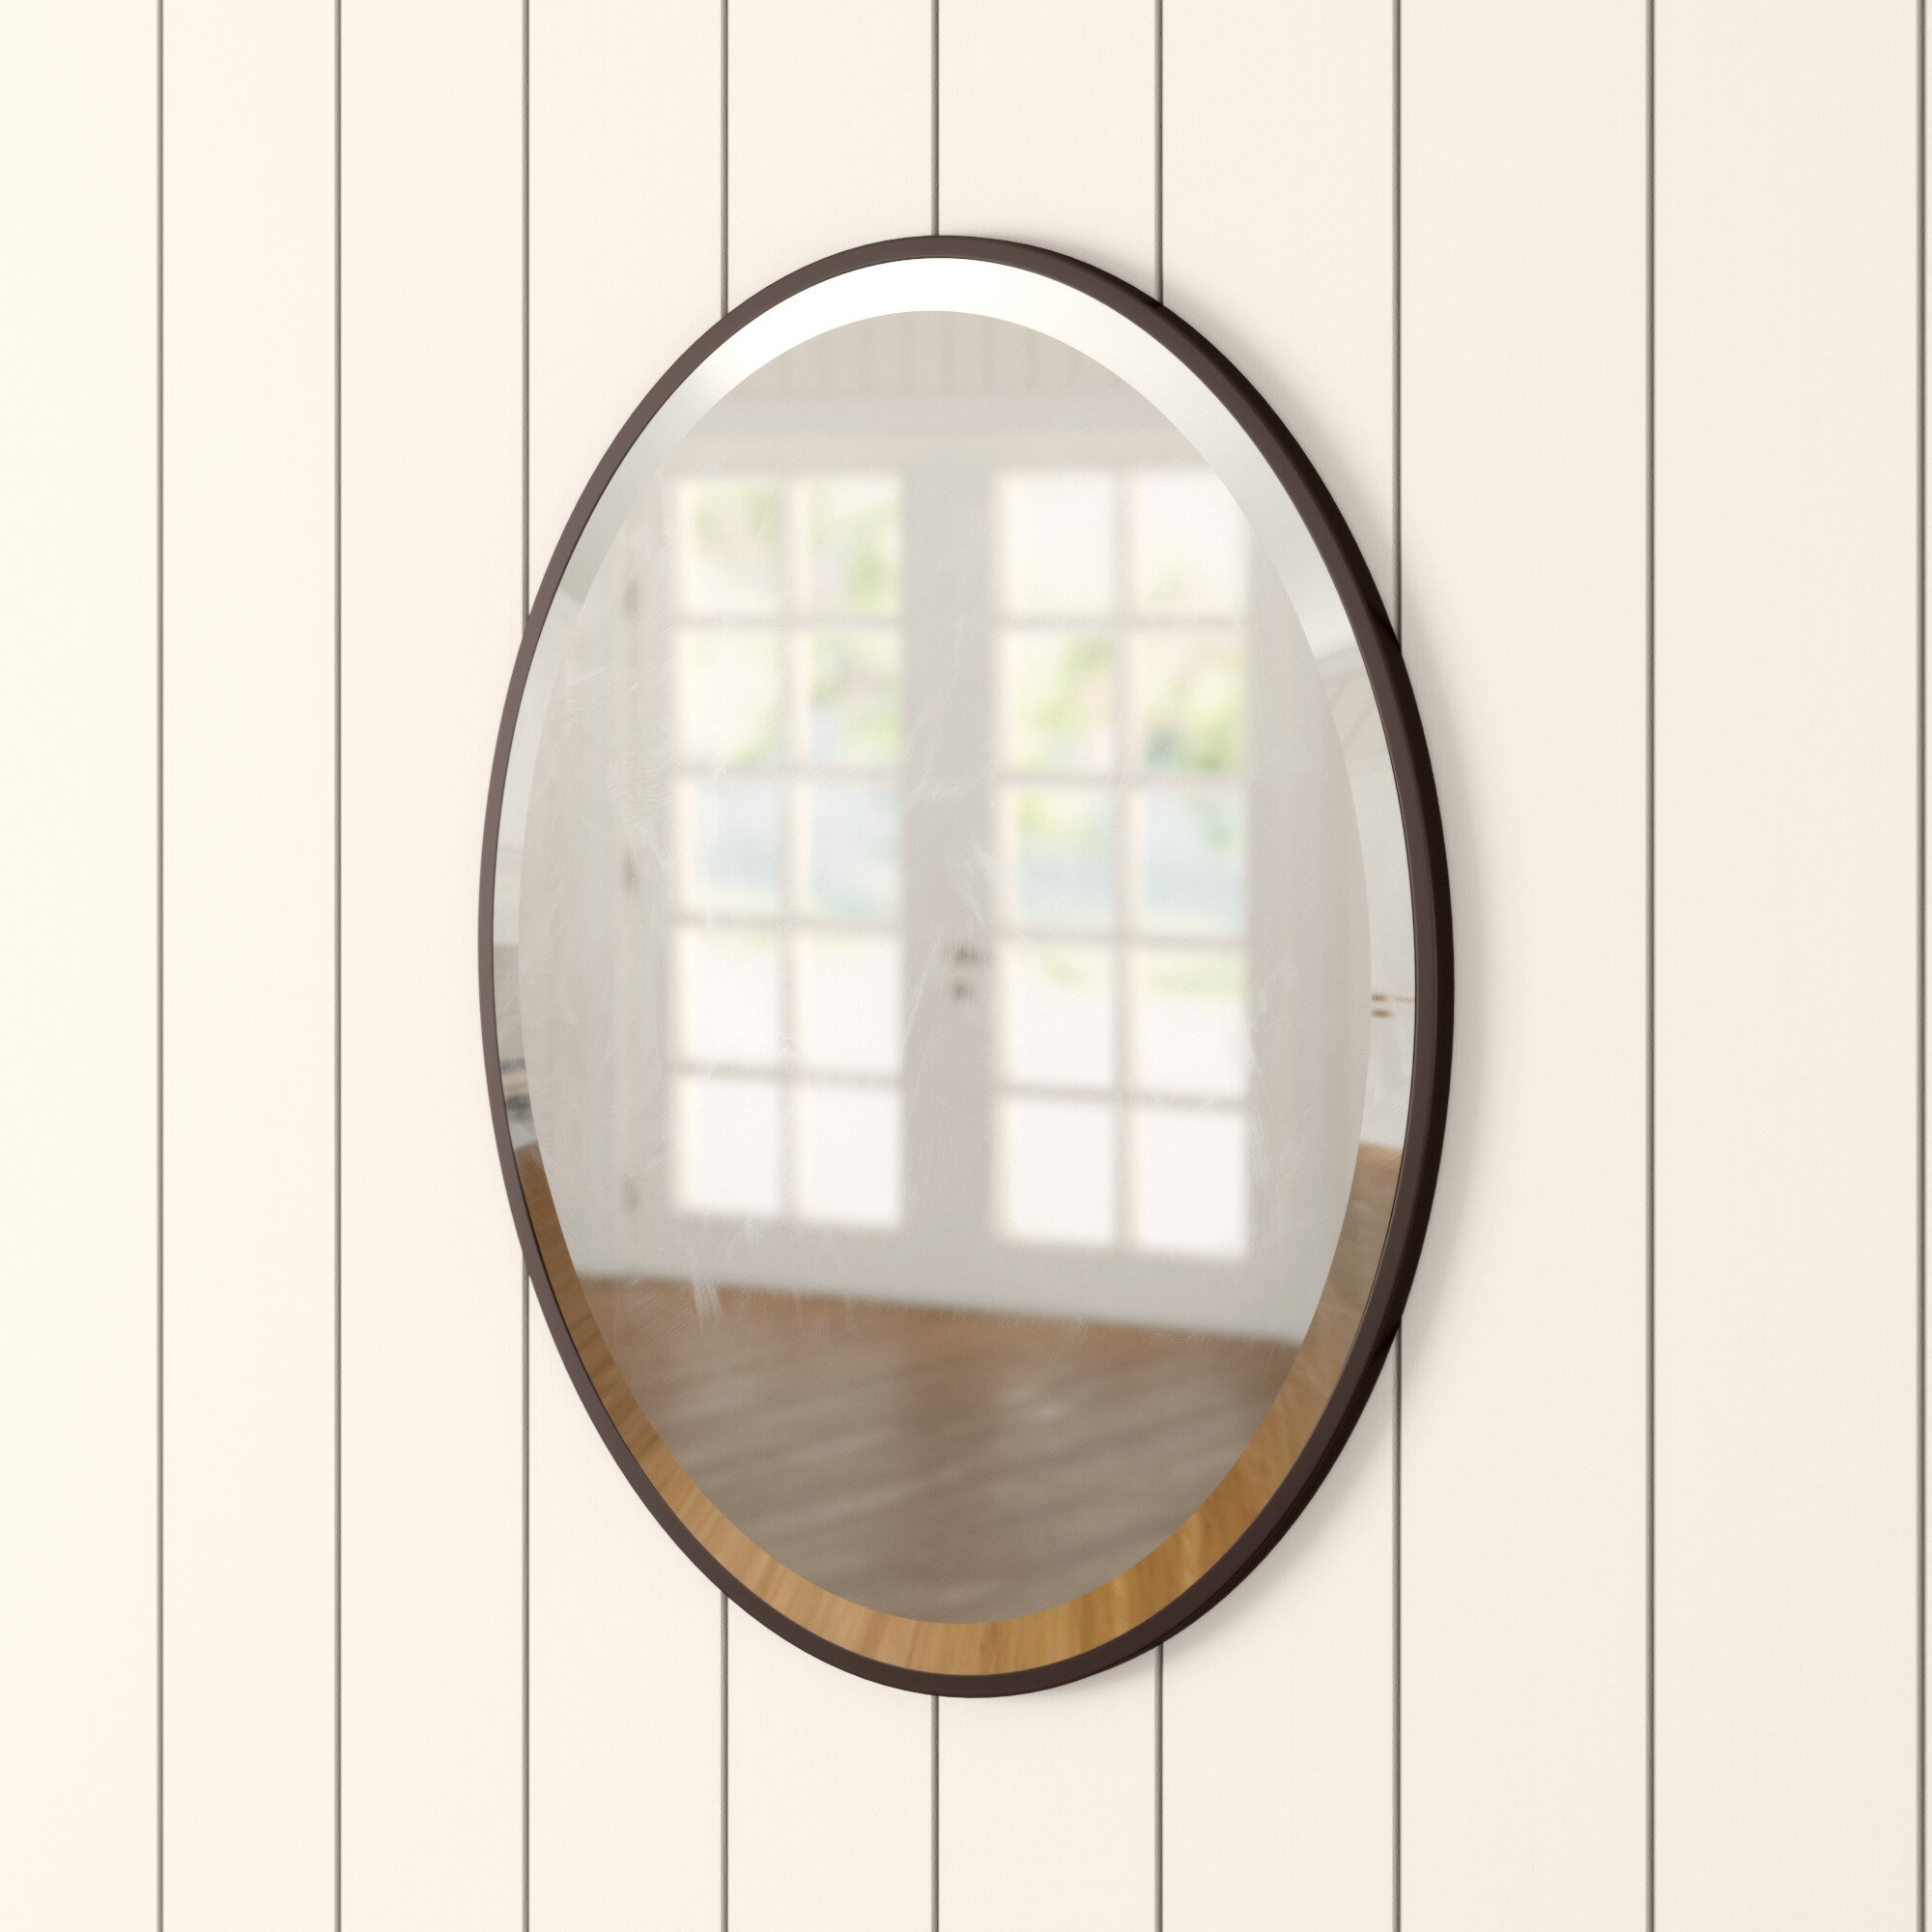 Birch Lane Heritage Lincolnwood Oval Bathroom Vanity Mirror